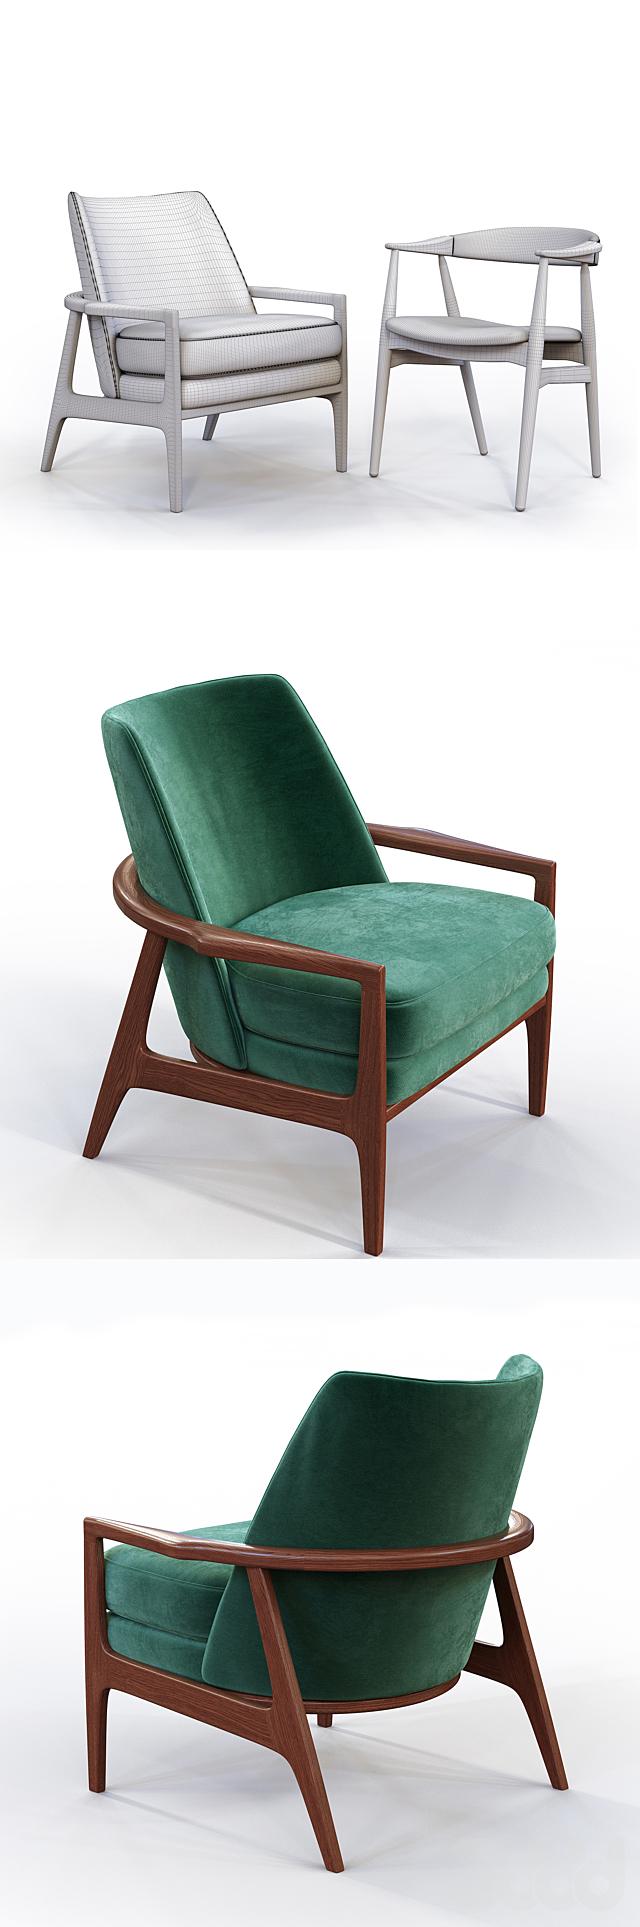 Vintage armchair 1960s